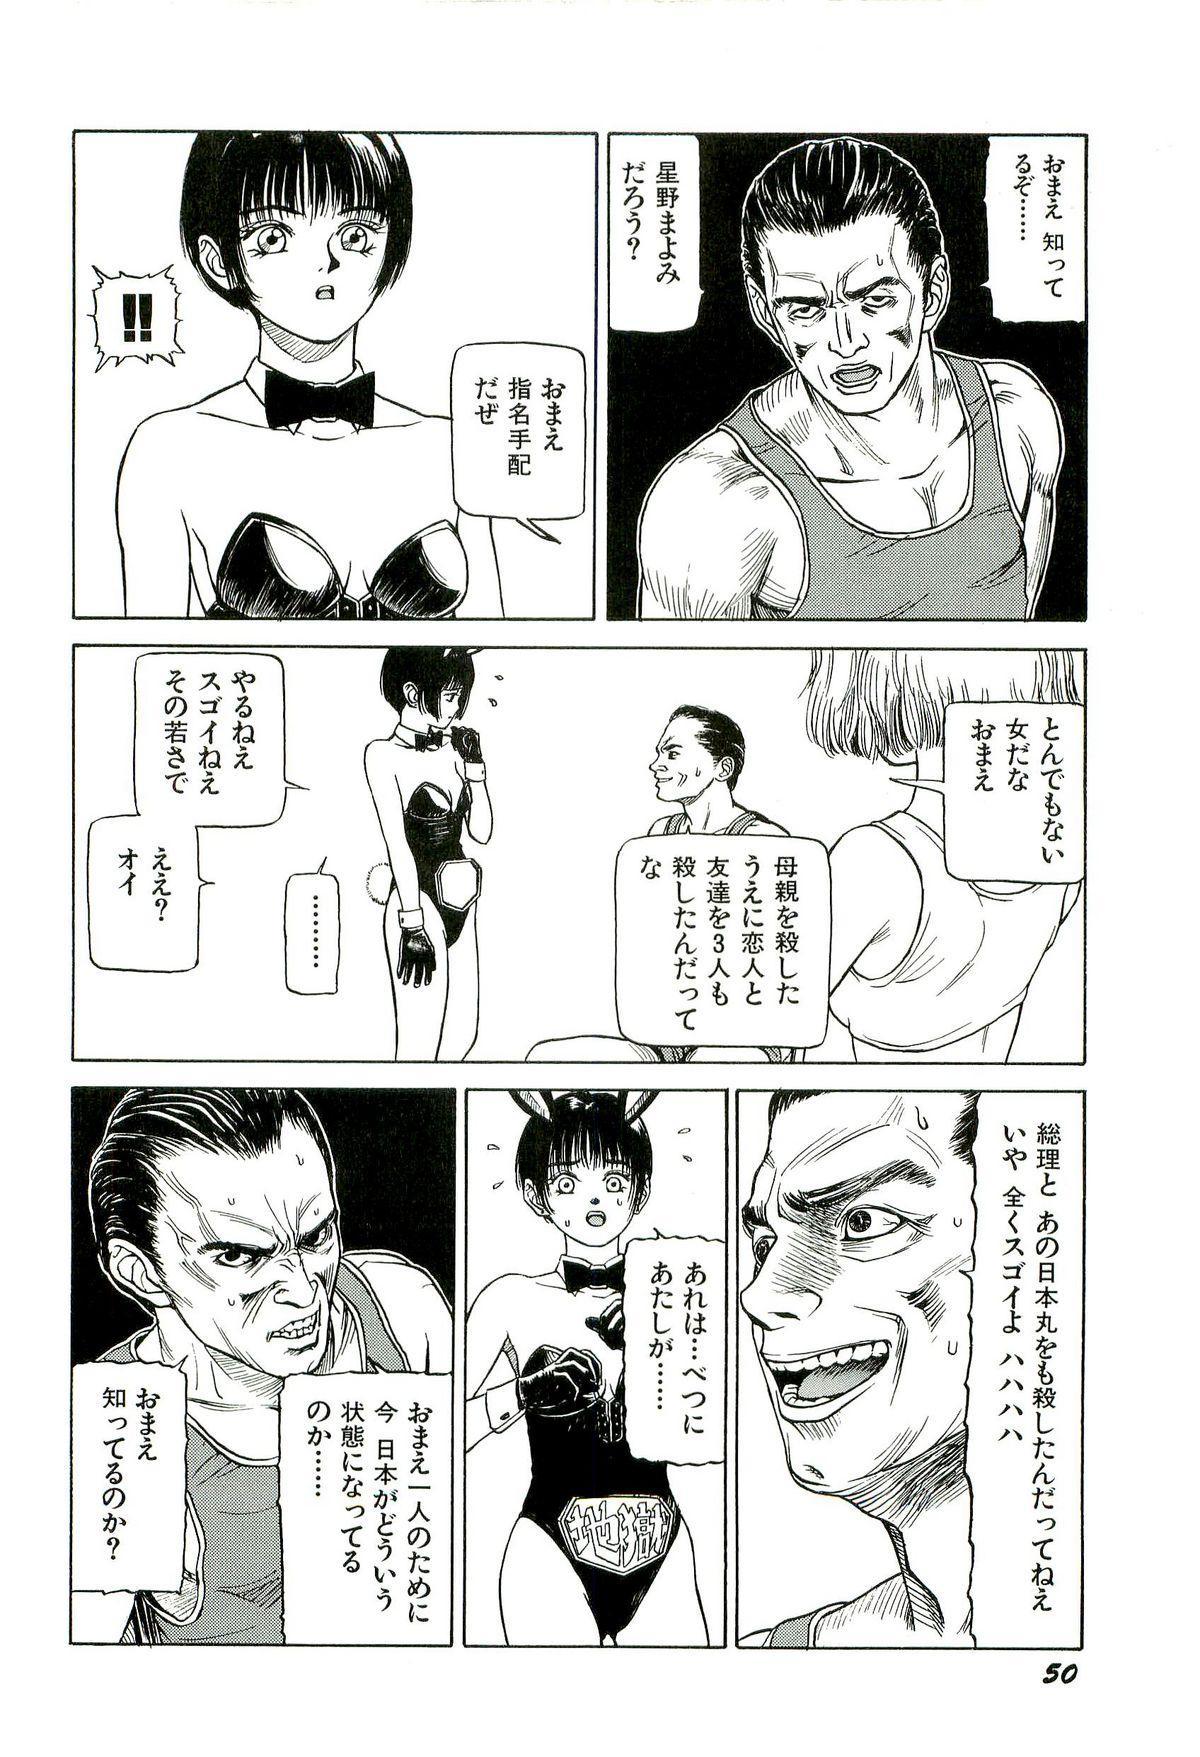 Jigokugumi no Onna 1 51